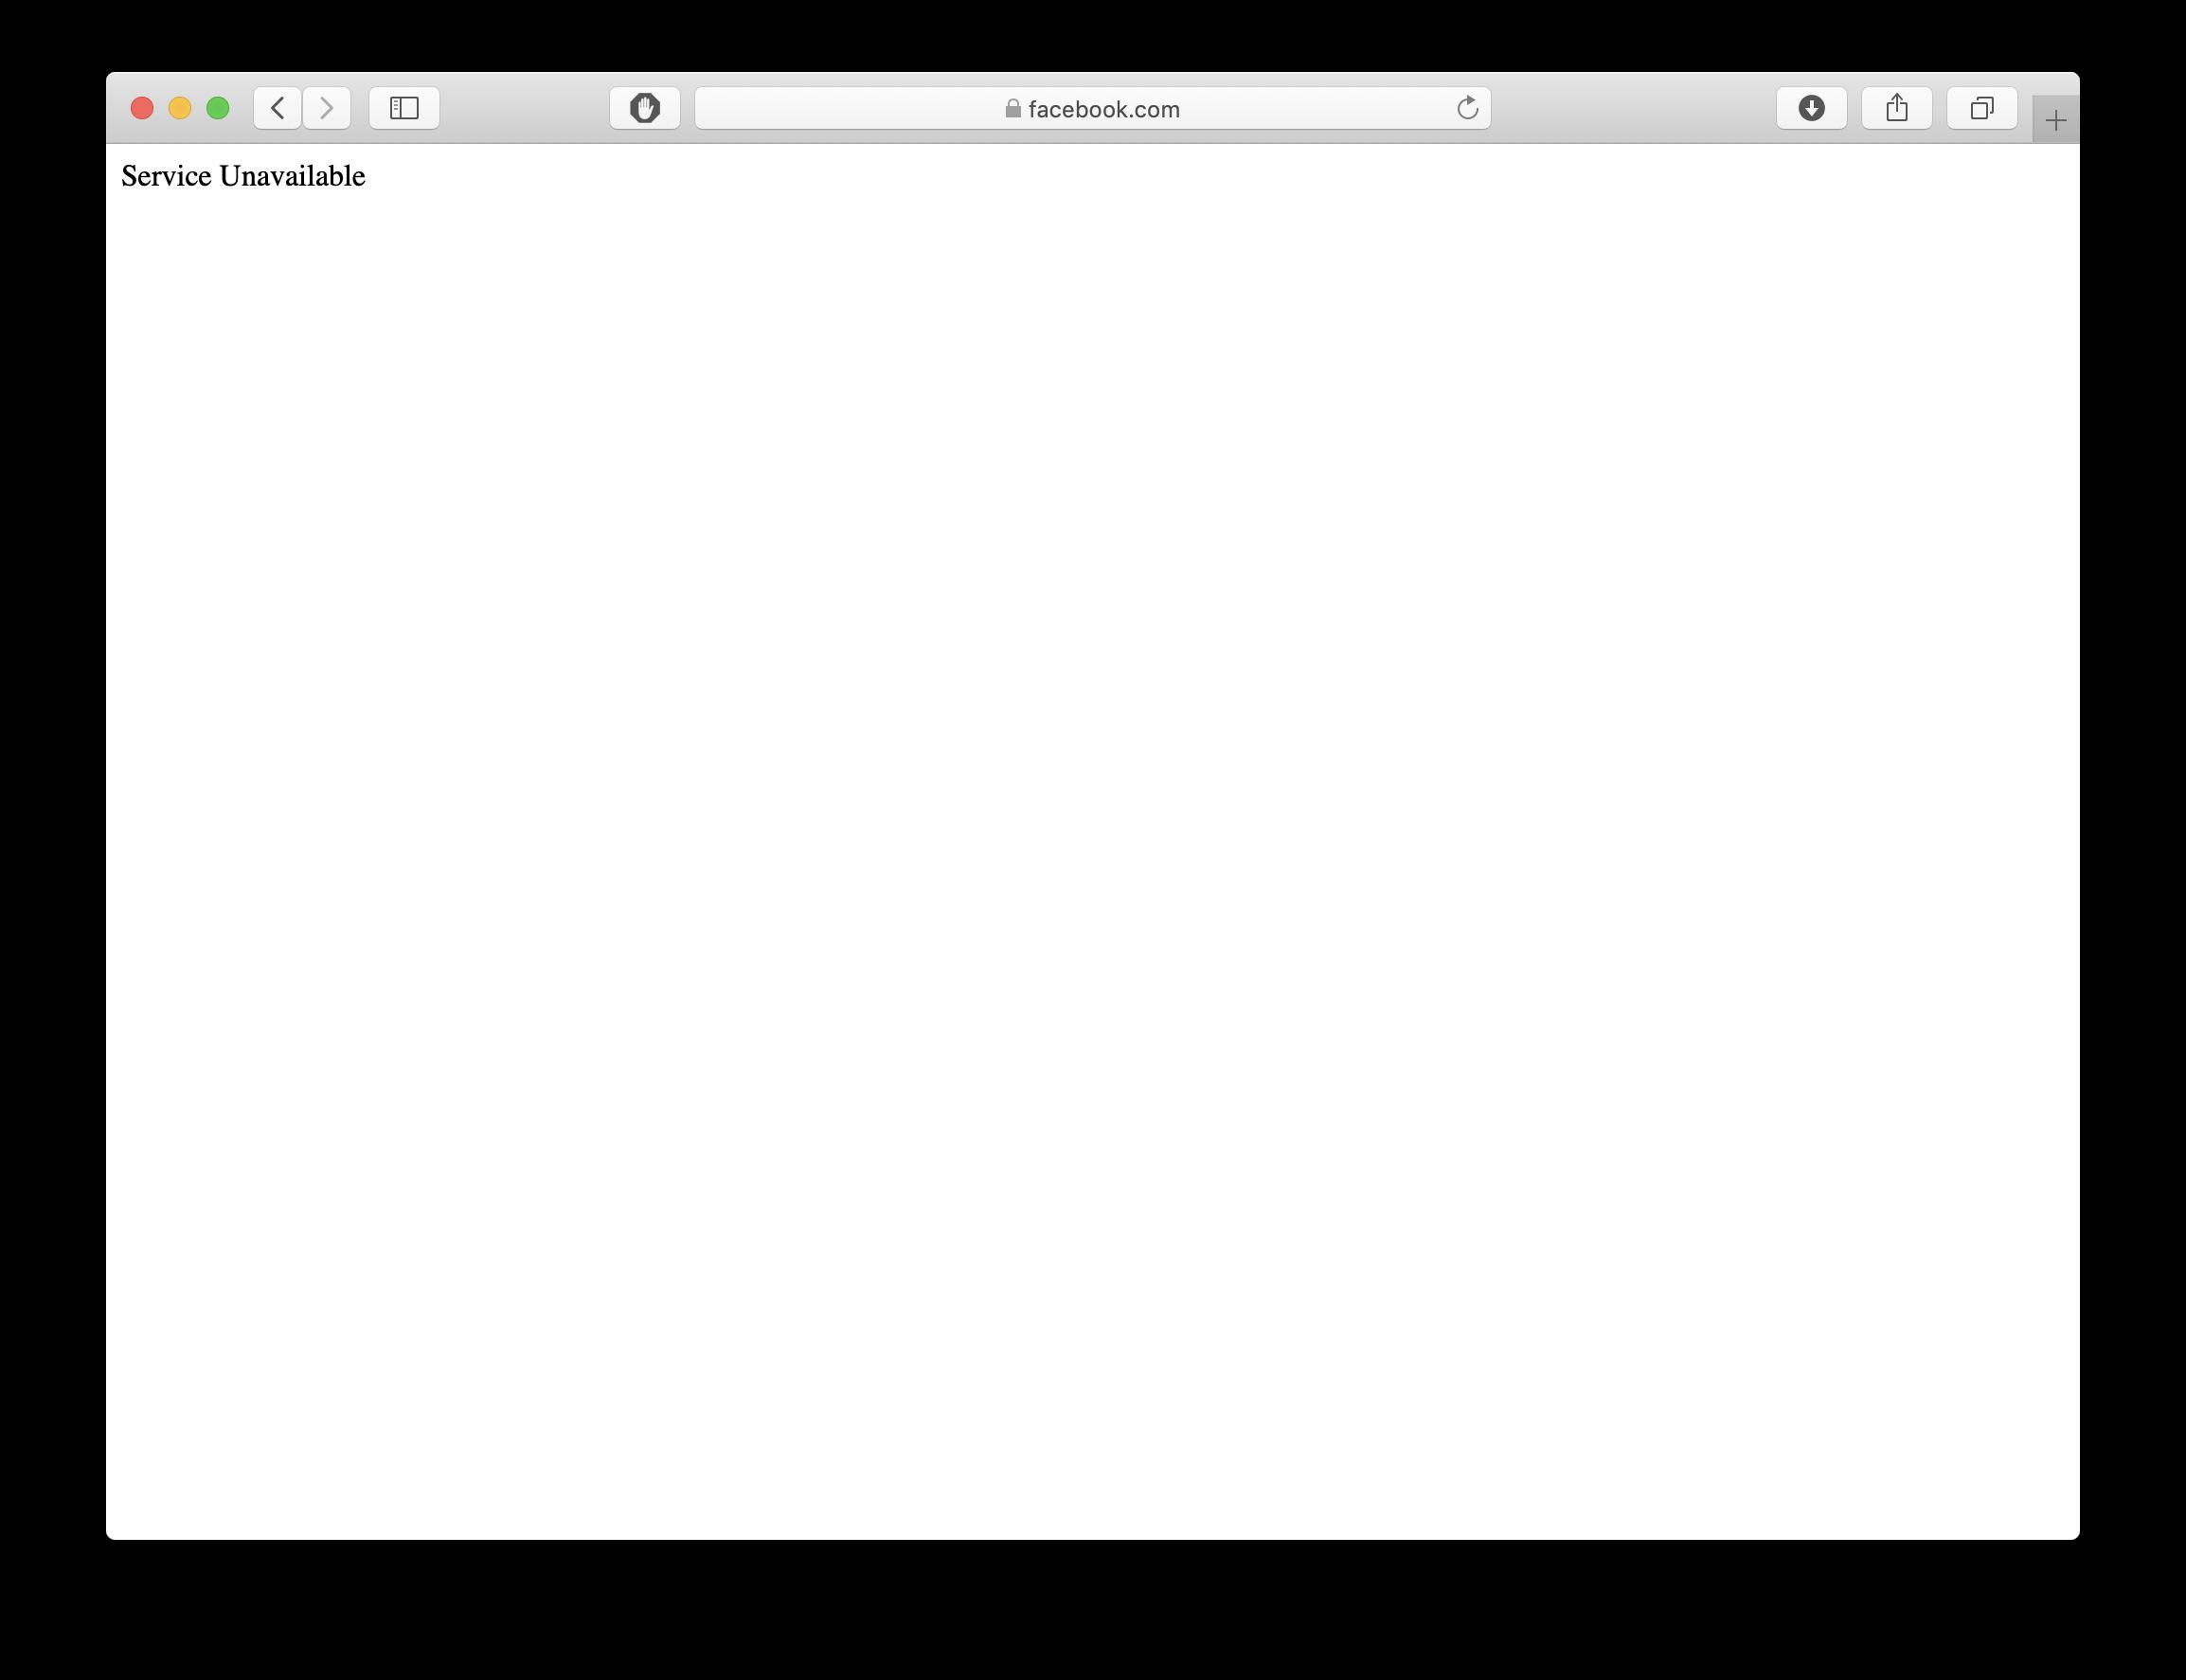 Zrzut ekranu 2020 09 17 o 20.20.37